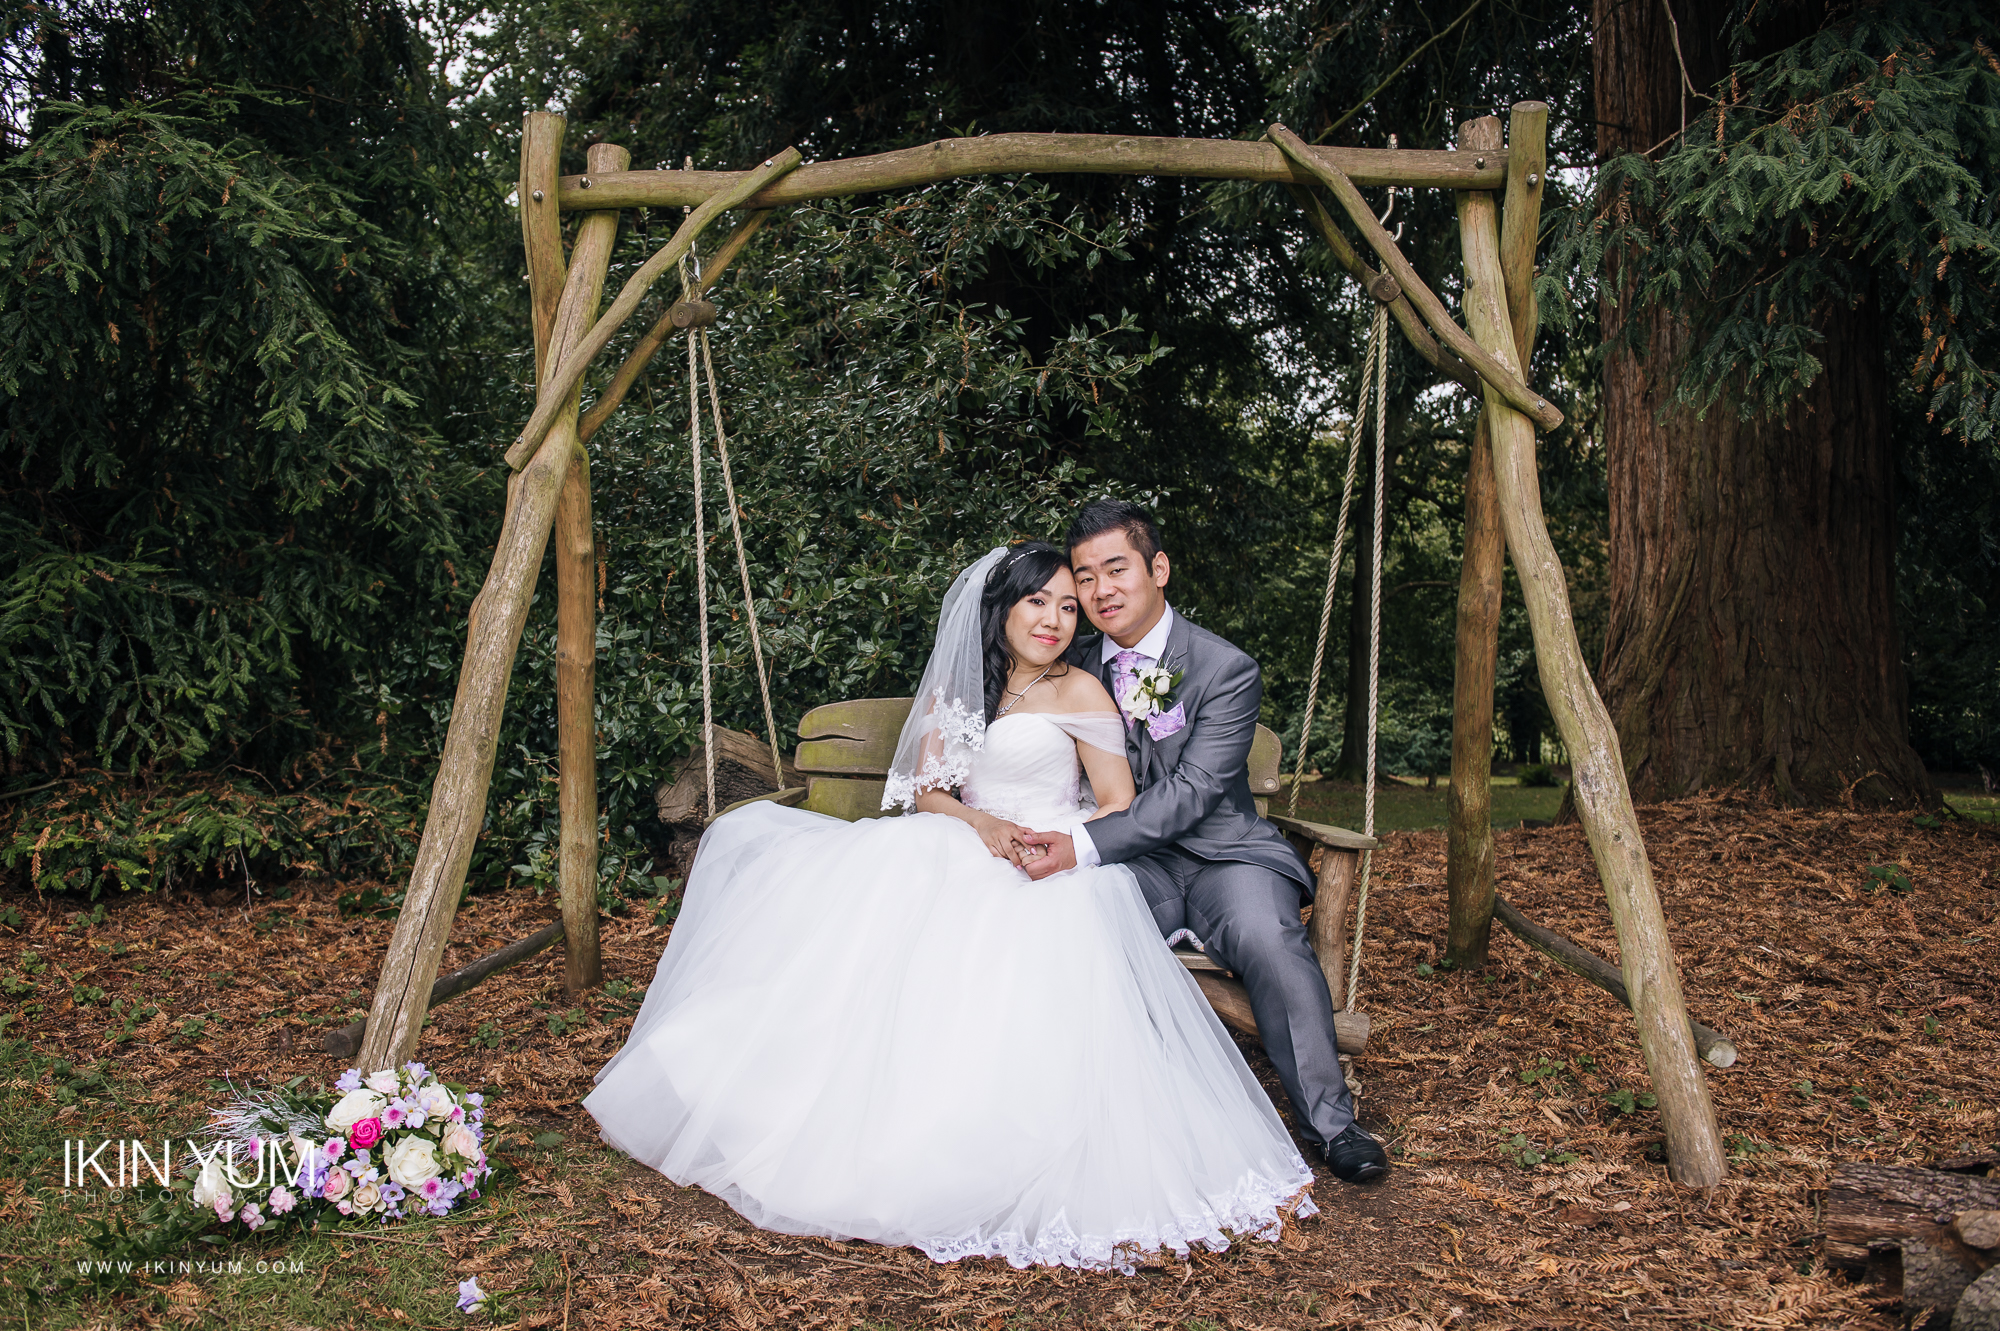 Hampton Manor Wedding - Ikin Yum Photography -107.jpg